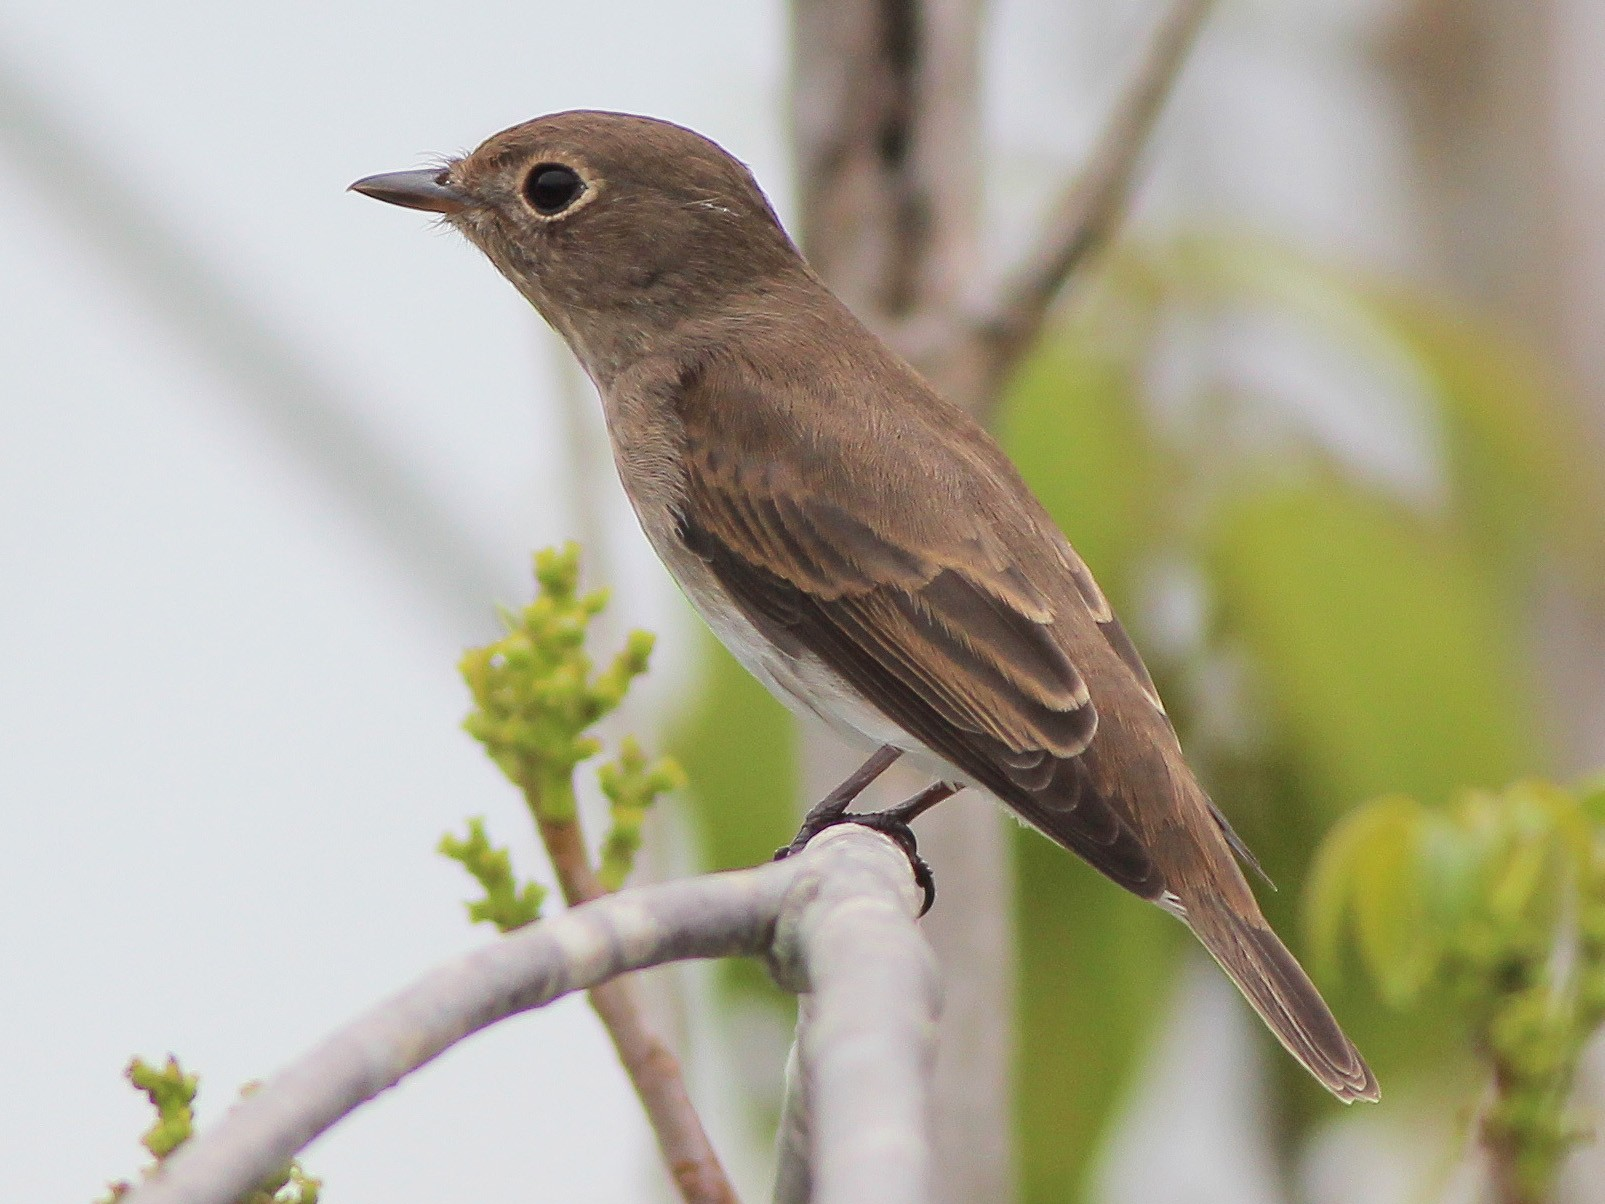 Brown-streaked Flycatcher - Neoh Hor Kee